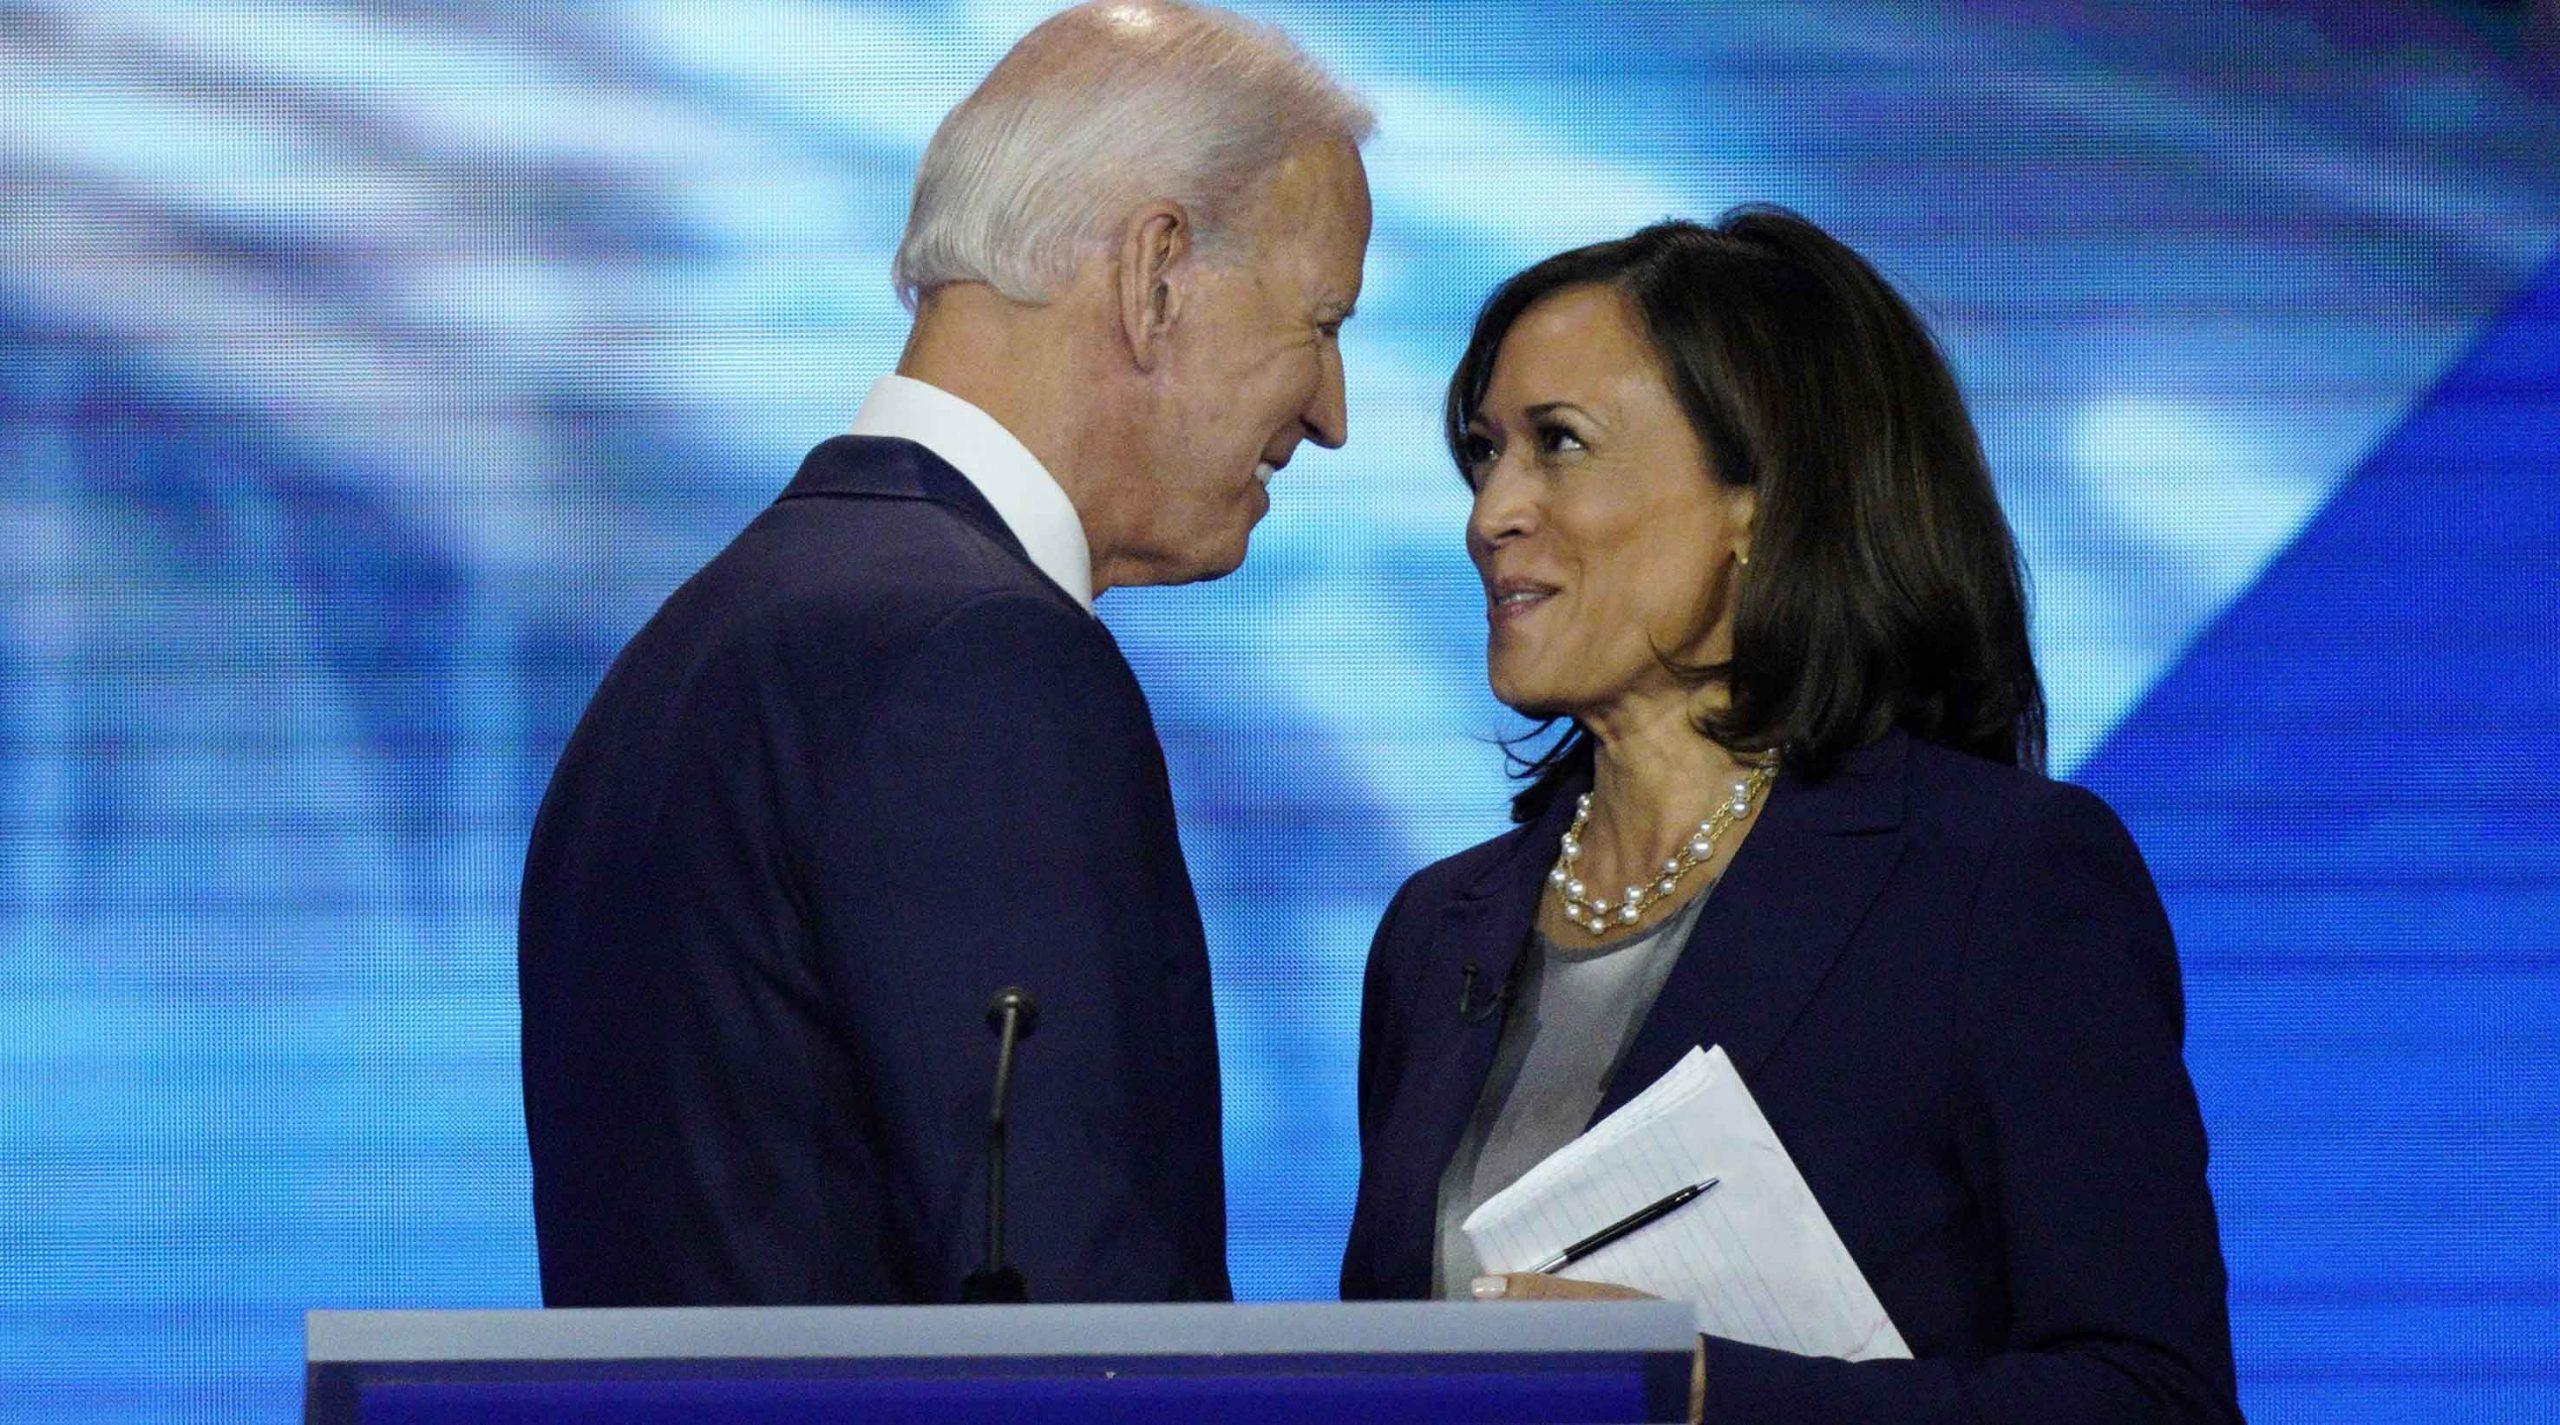 joe-biden-names-indian-american-senator-kamala-harris-as-his-running-mate